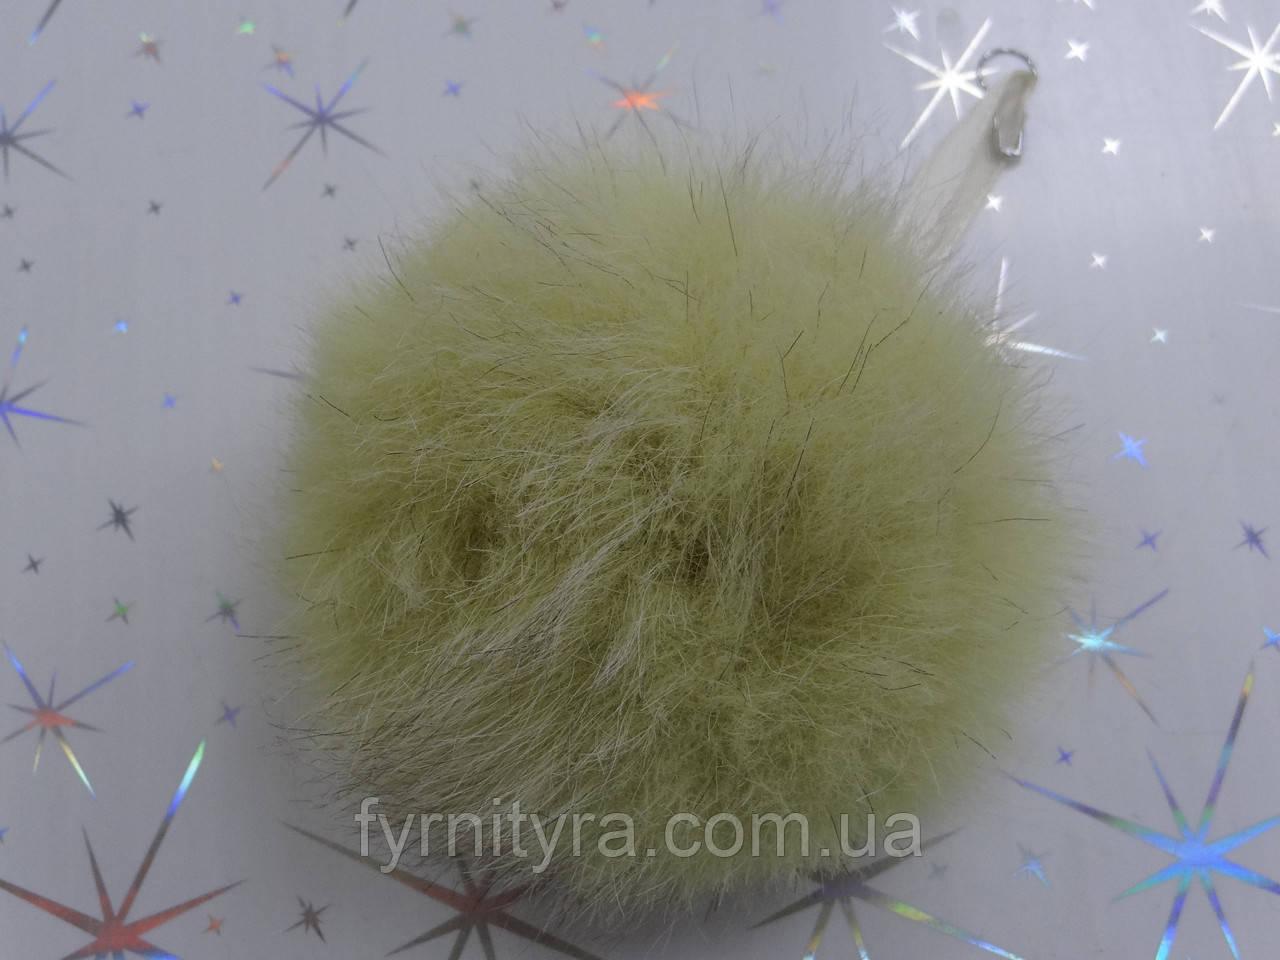 Помпони-хутро, балабон, бубон білий 7-9см кролик